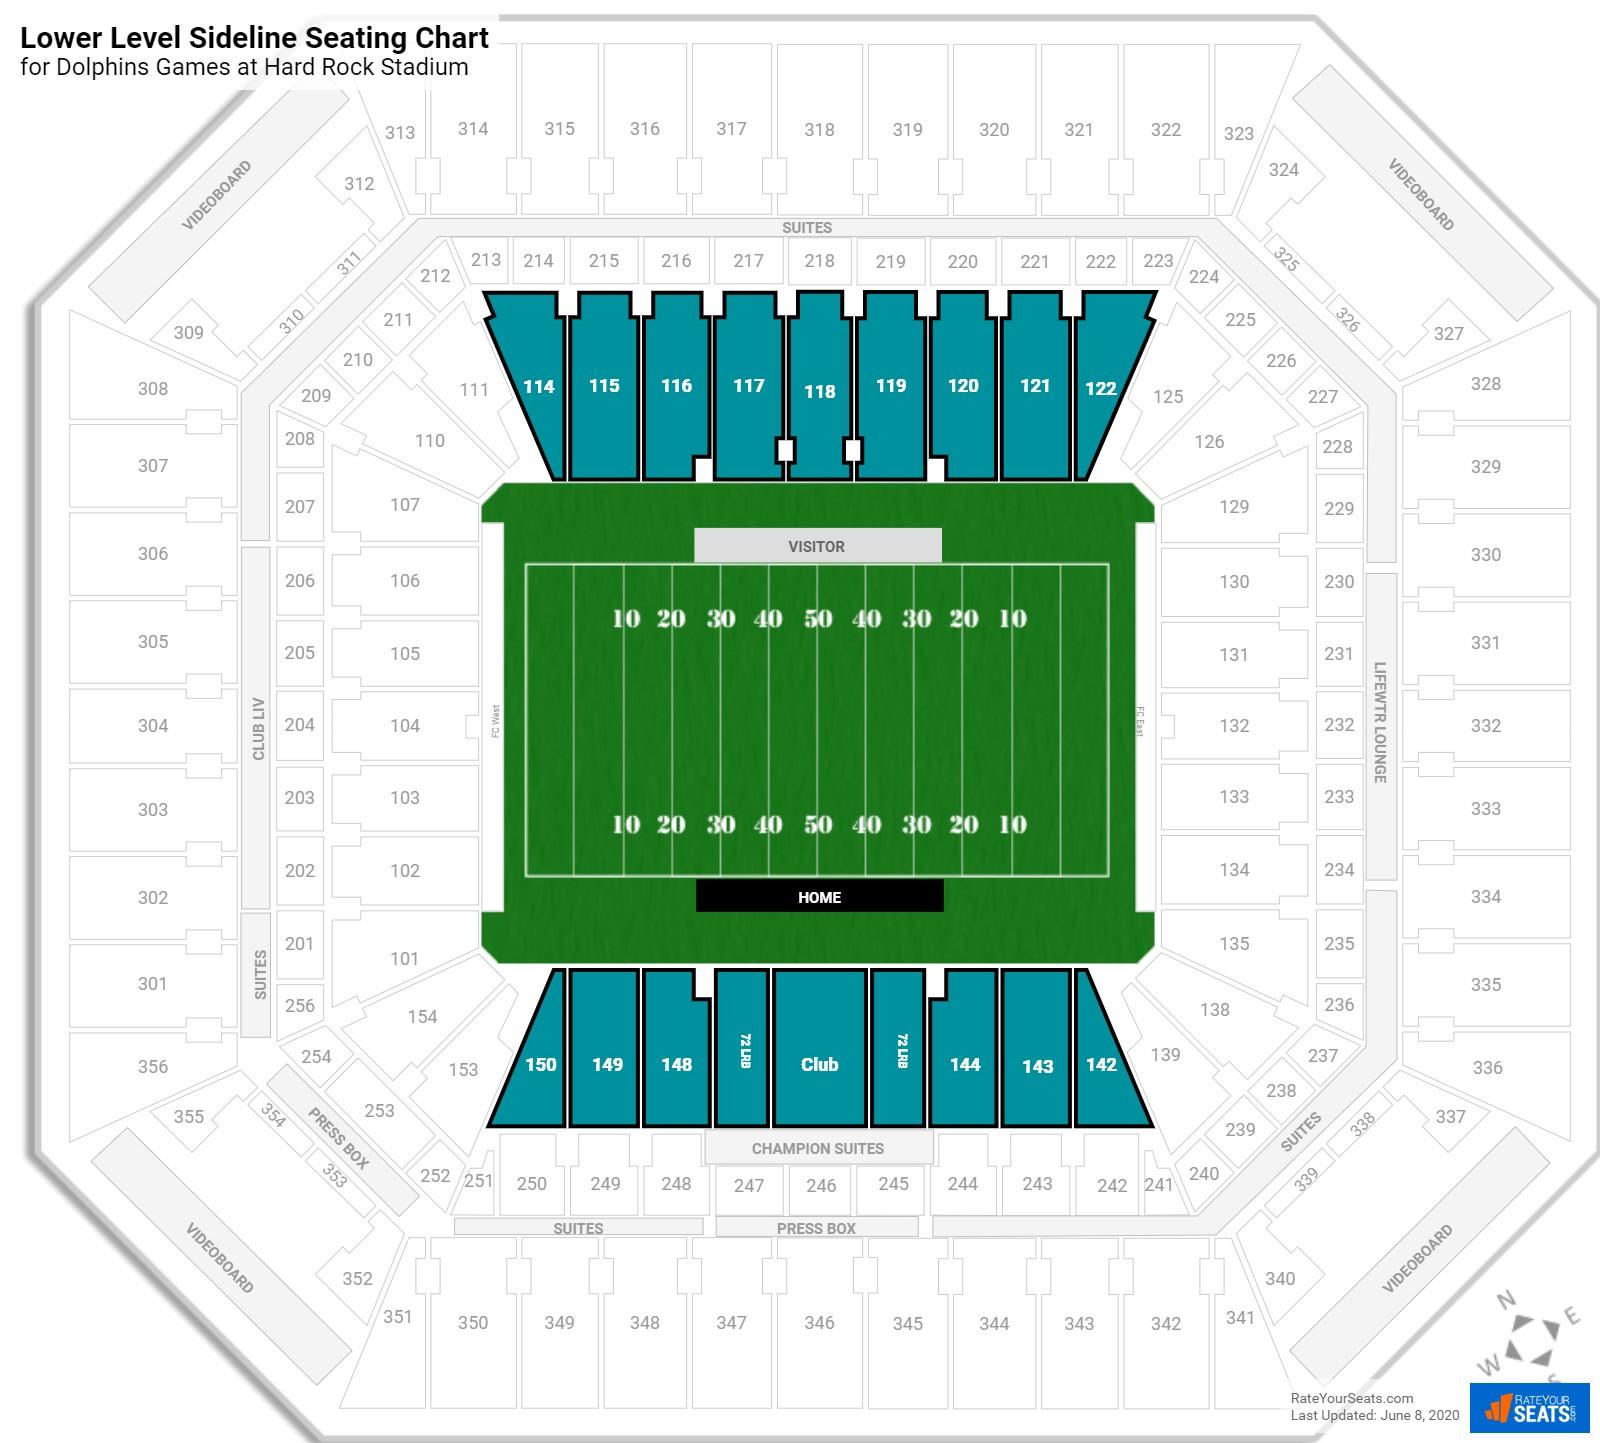 Hard Rock Stadium Club Level Sideline   Football Seating   RateYourSeats.com